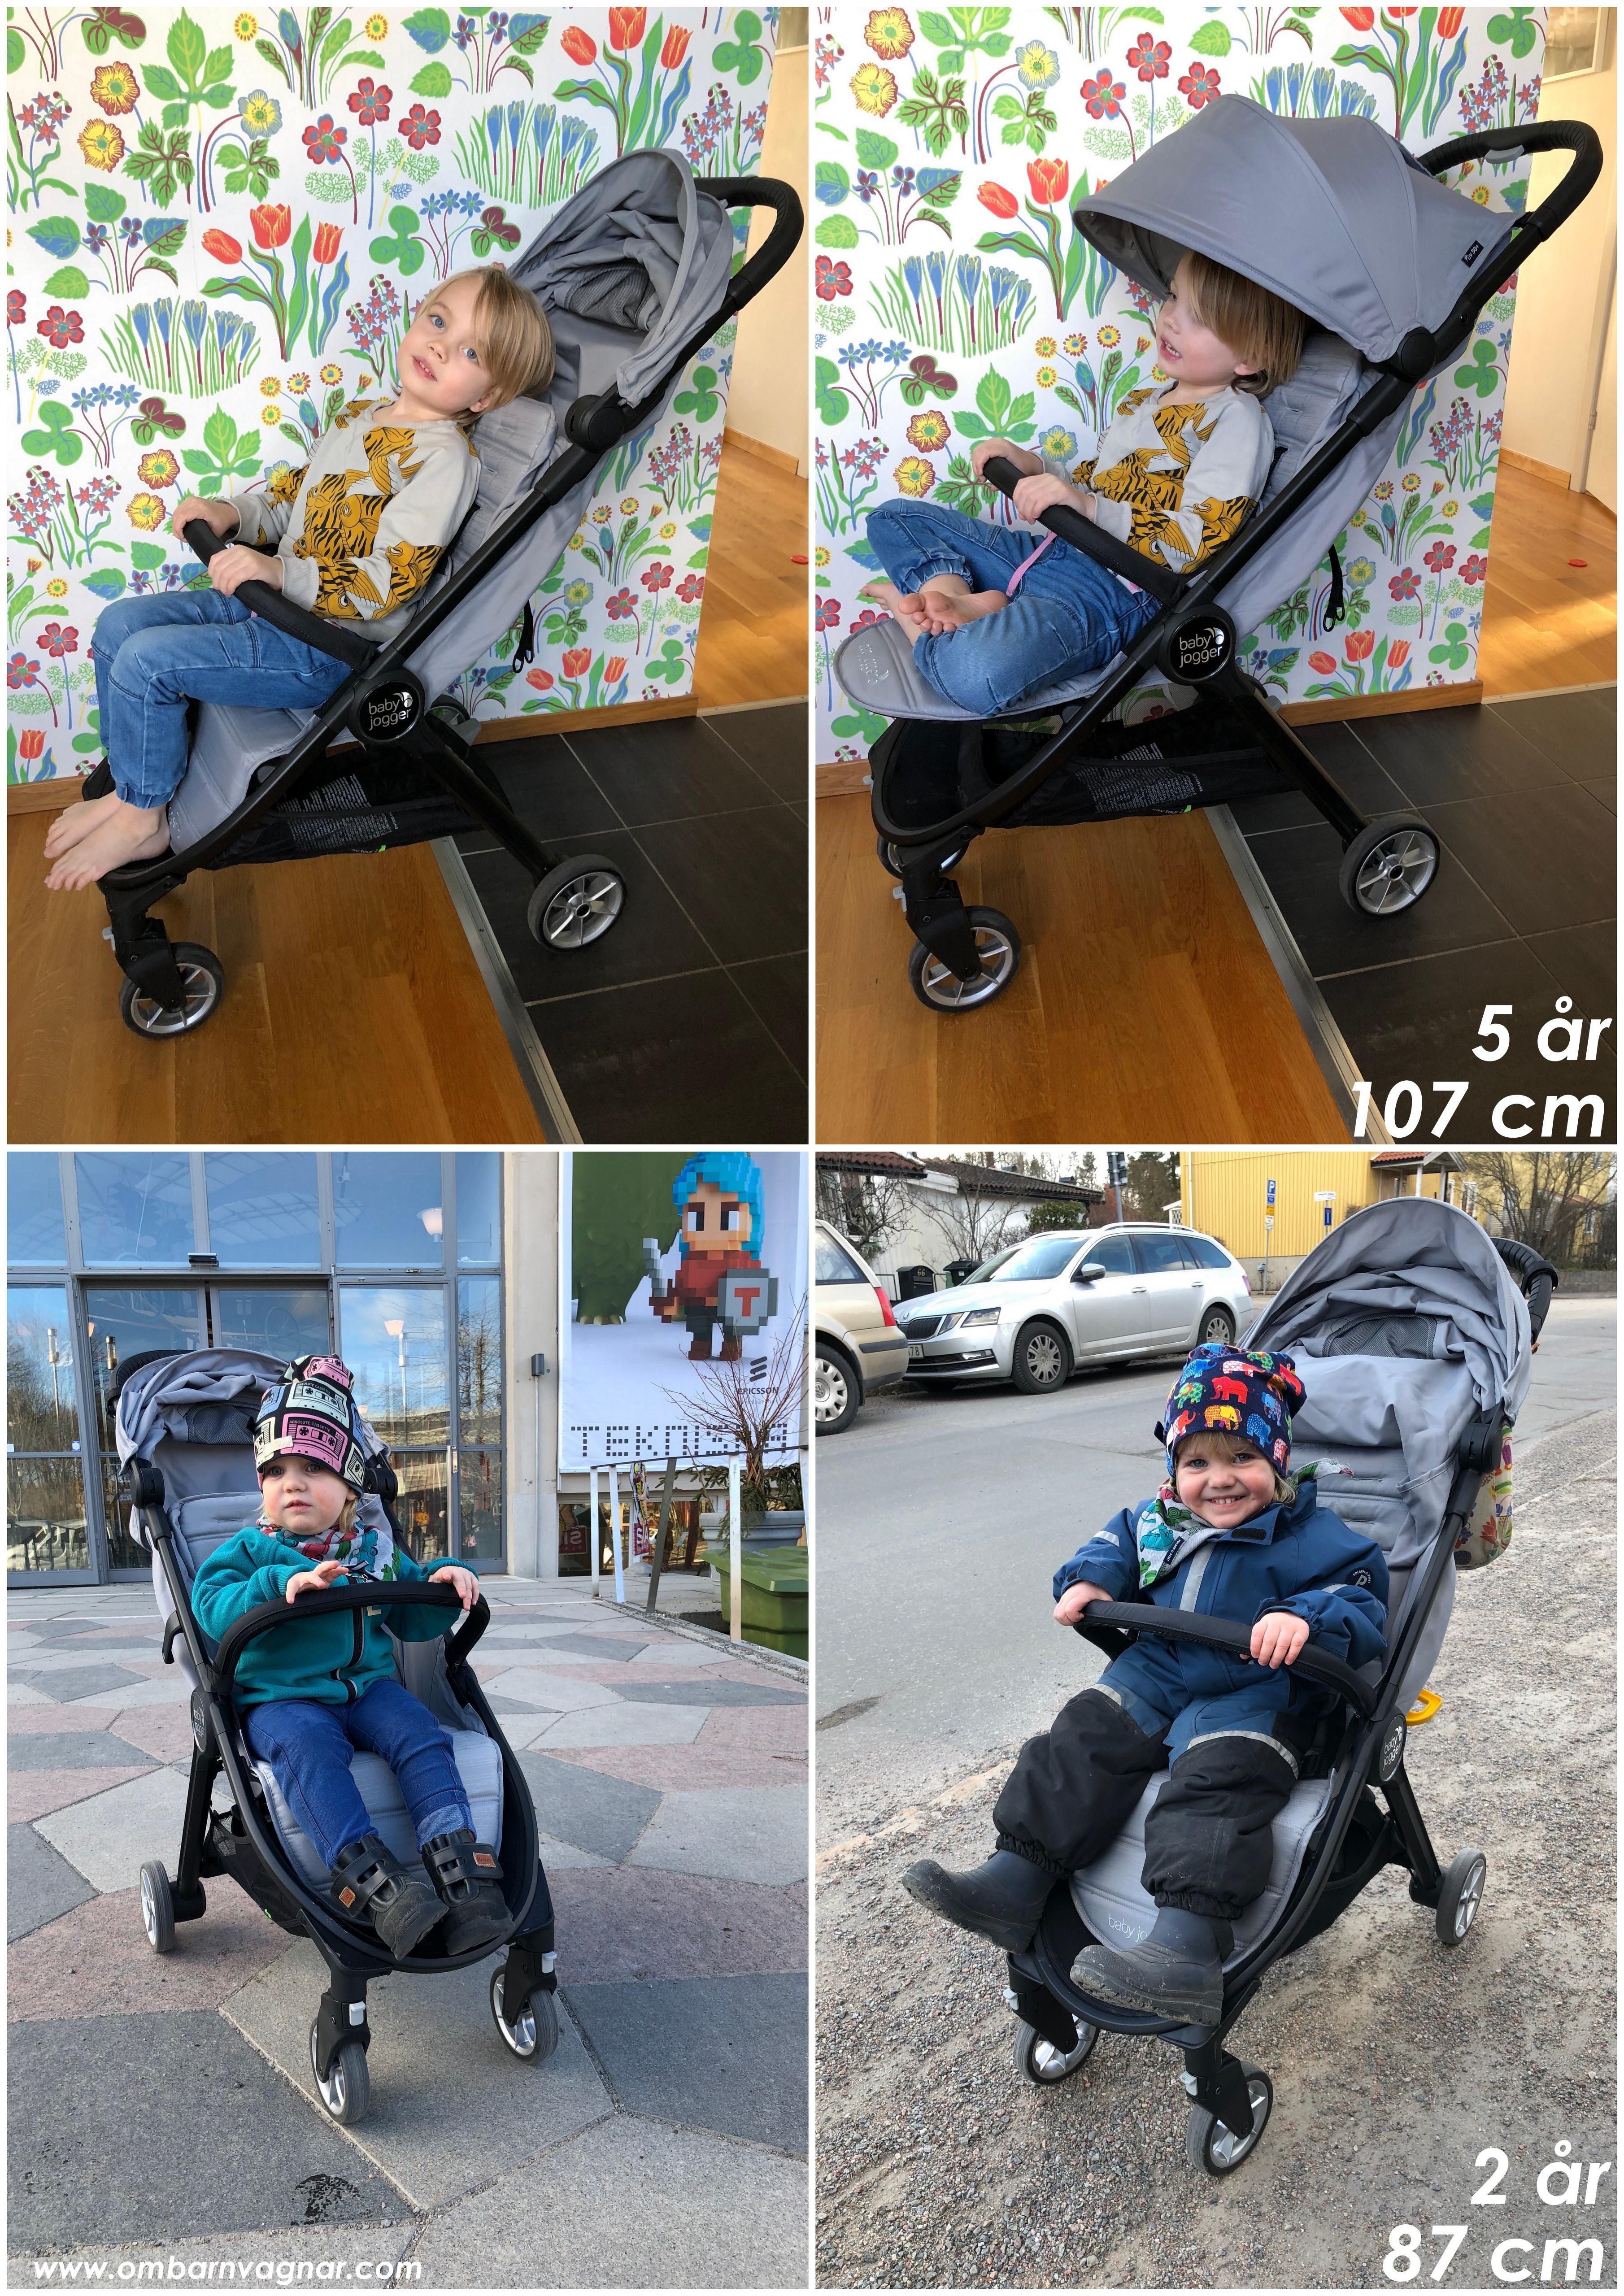 Baby Jogger City Tour 2 utrymme för barnet